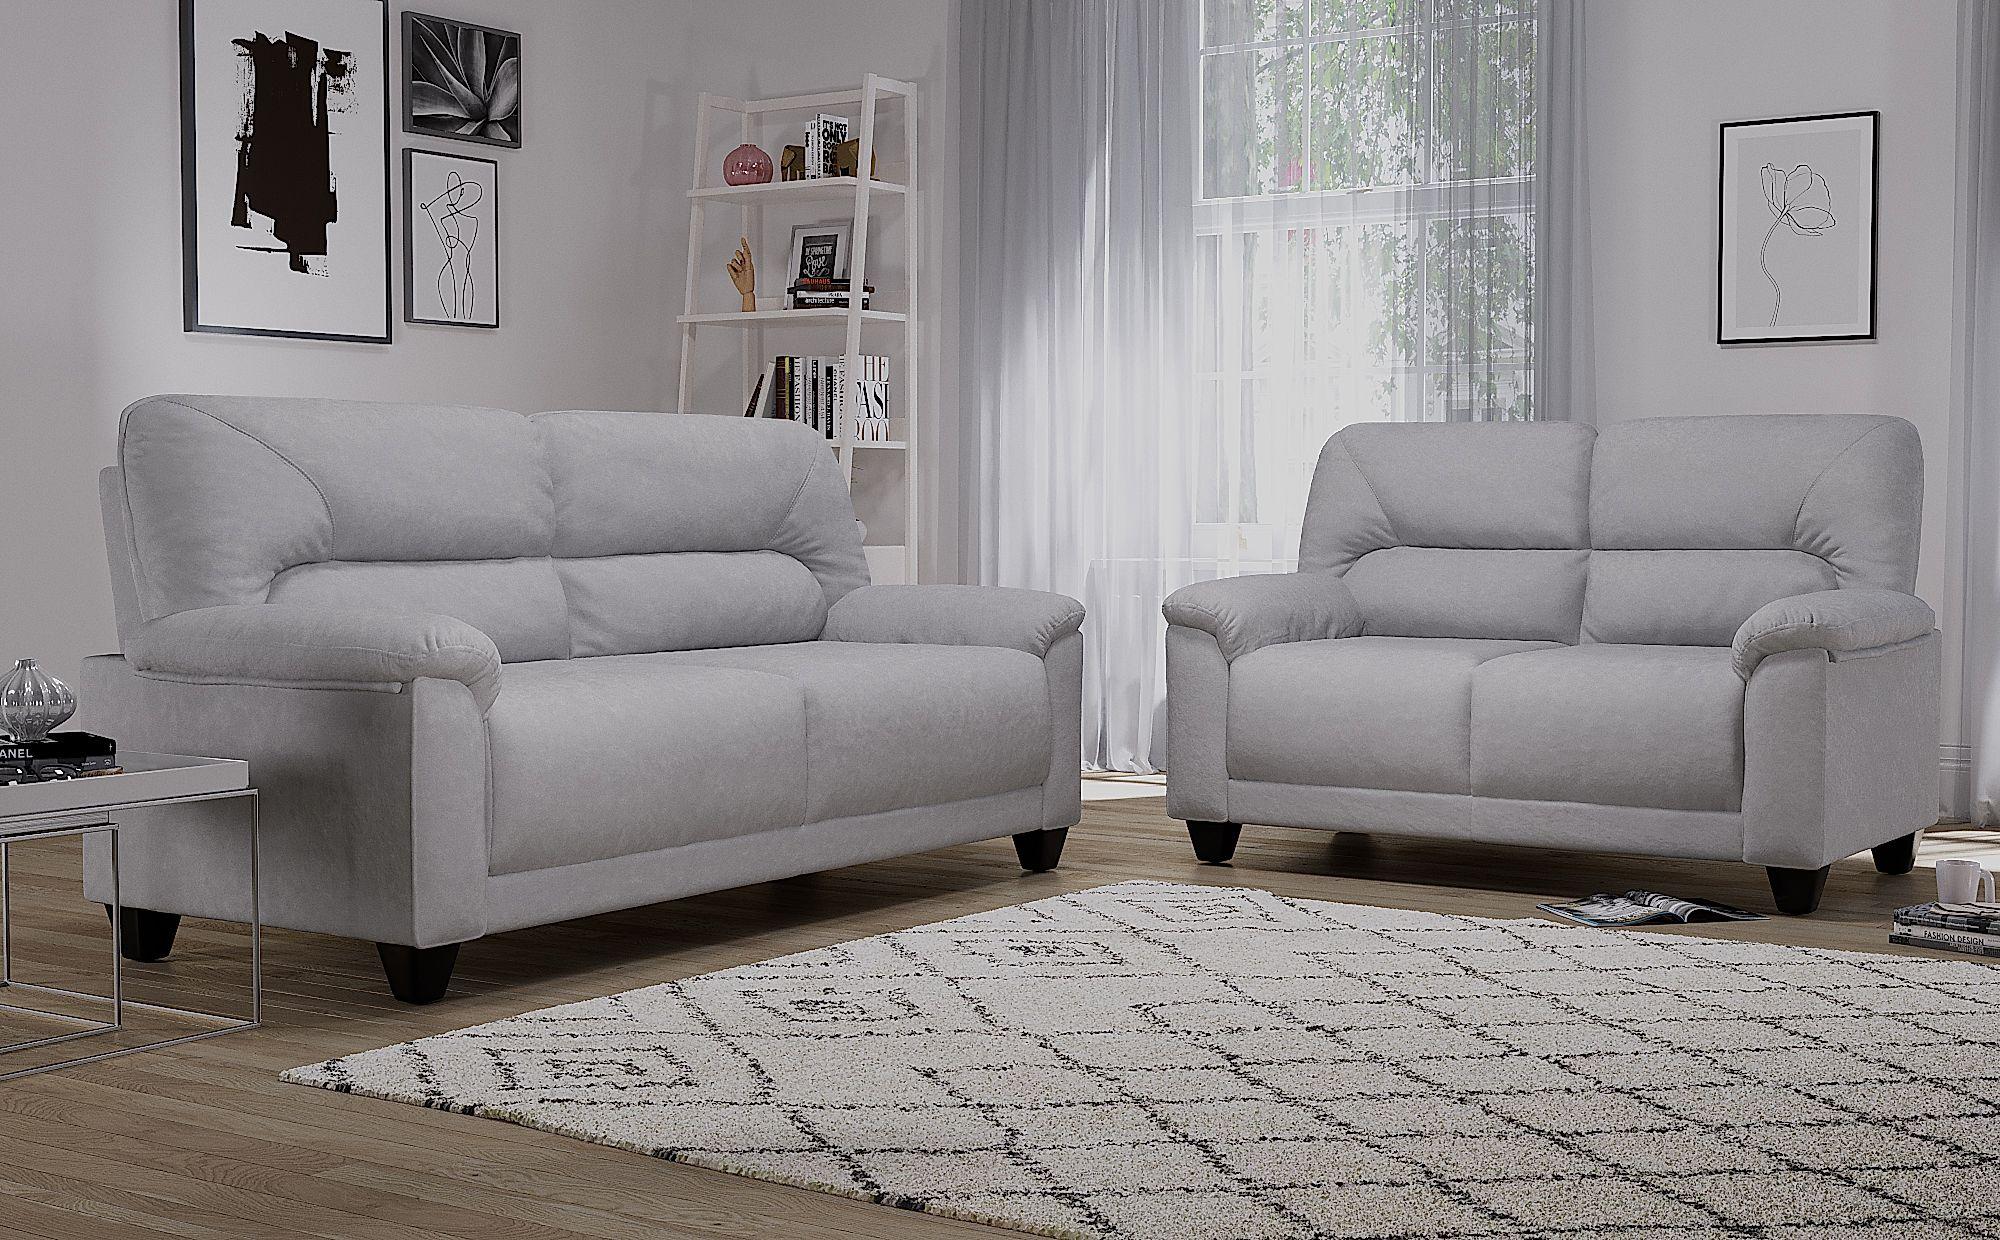 6aa8896f15 Austin Small Dove Grey Plush Fabric Sofa 3+2 Seater Only £549.98 ...